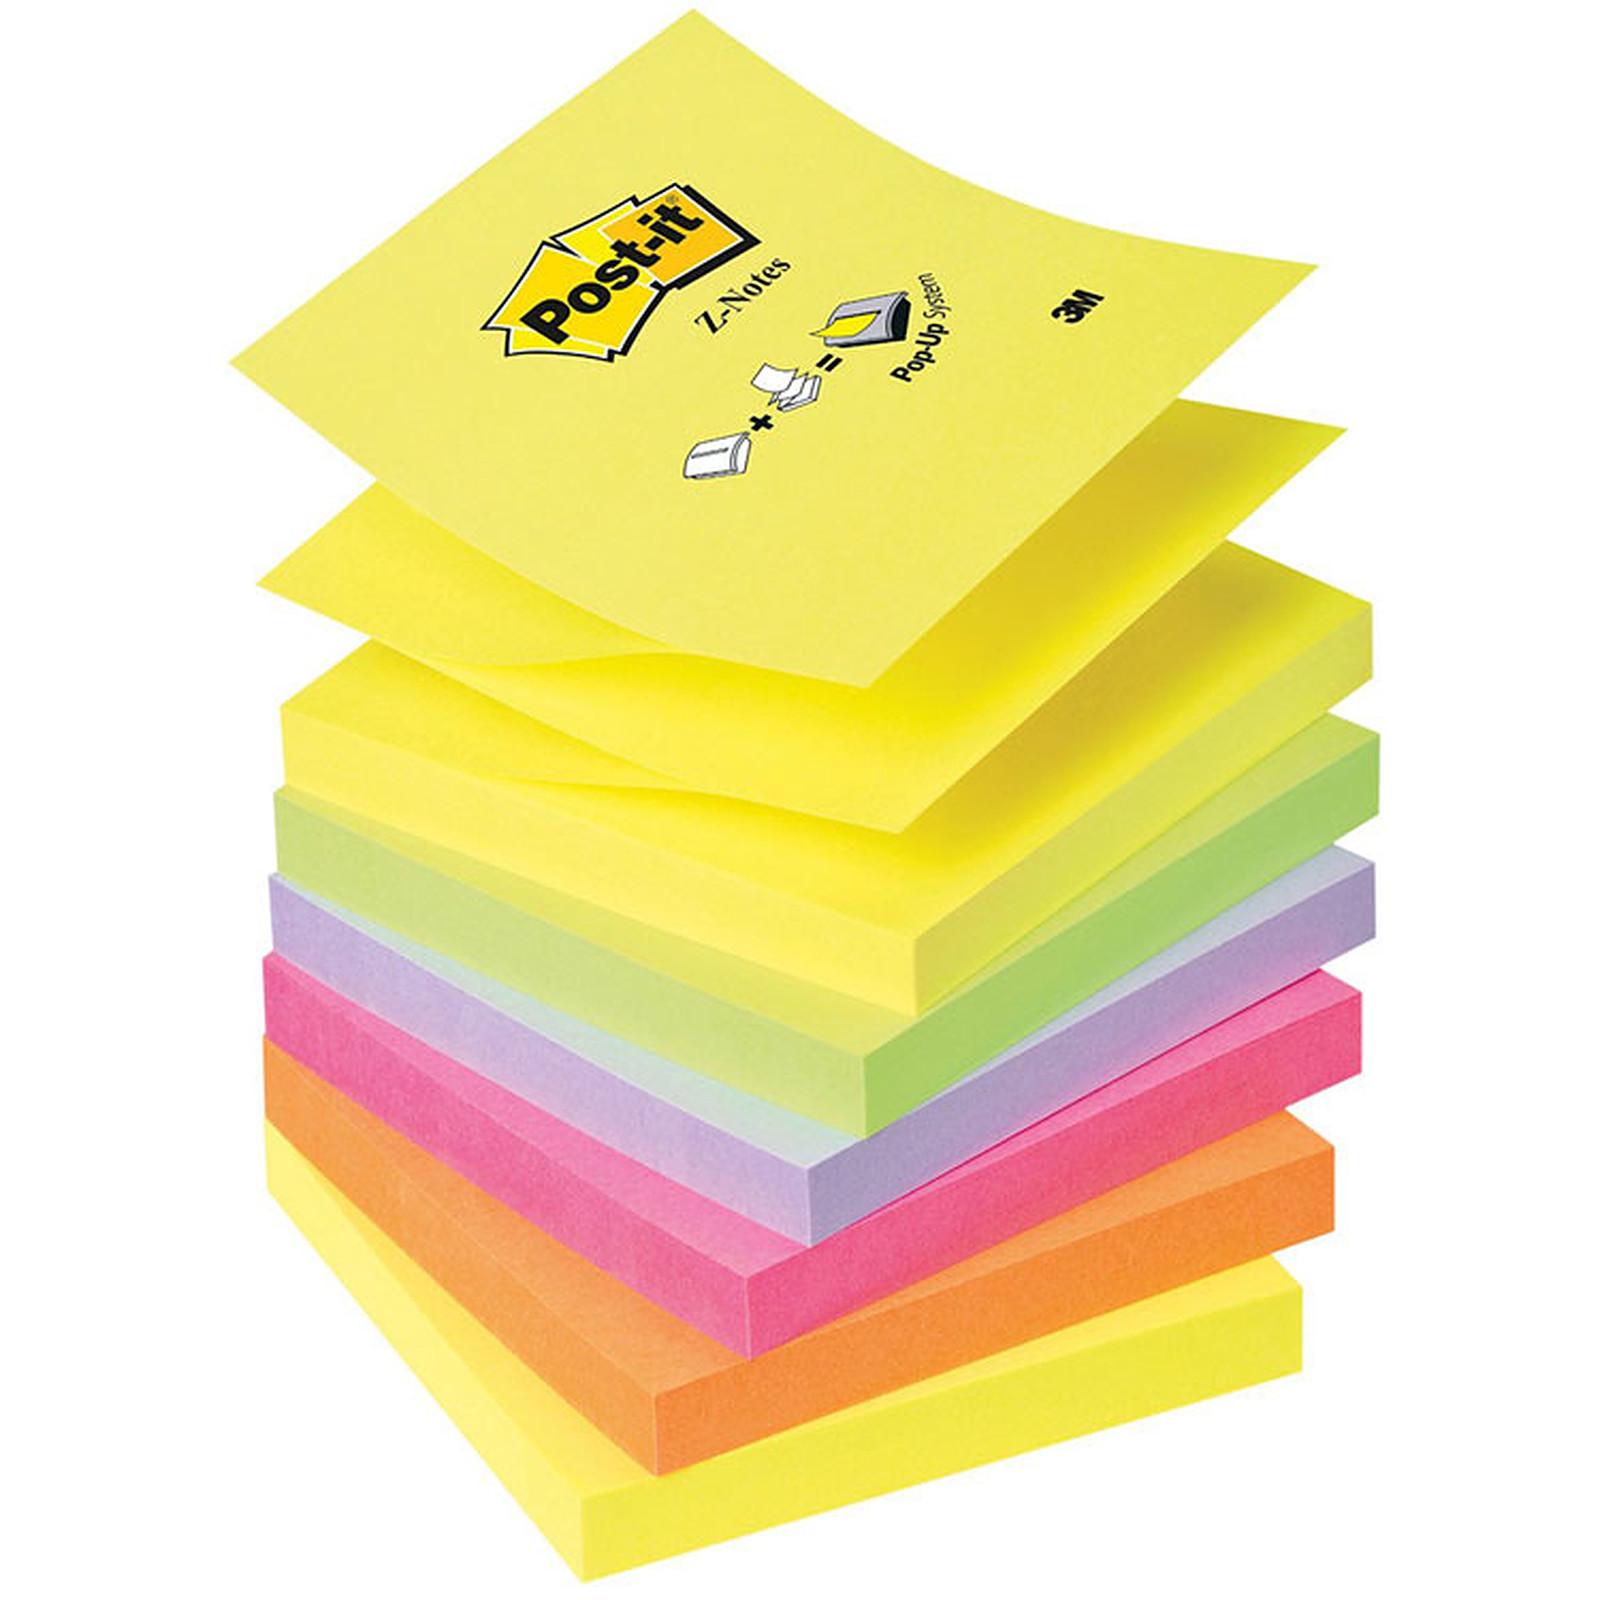 Post-it Notepad Z-notes 100 hojas 76 x 76 mm Hojas surtidas de neón x 6